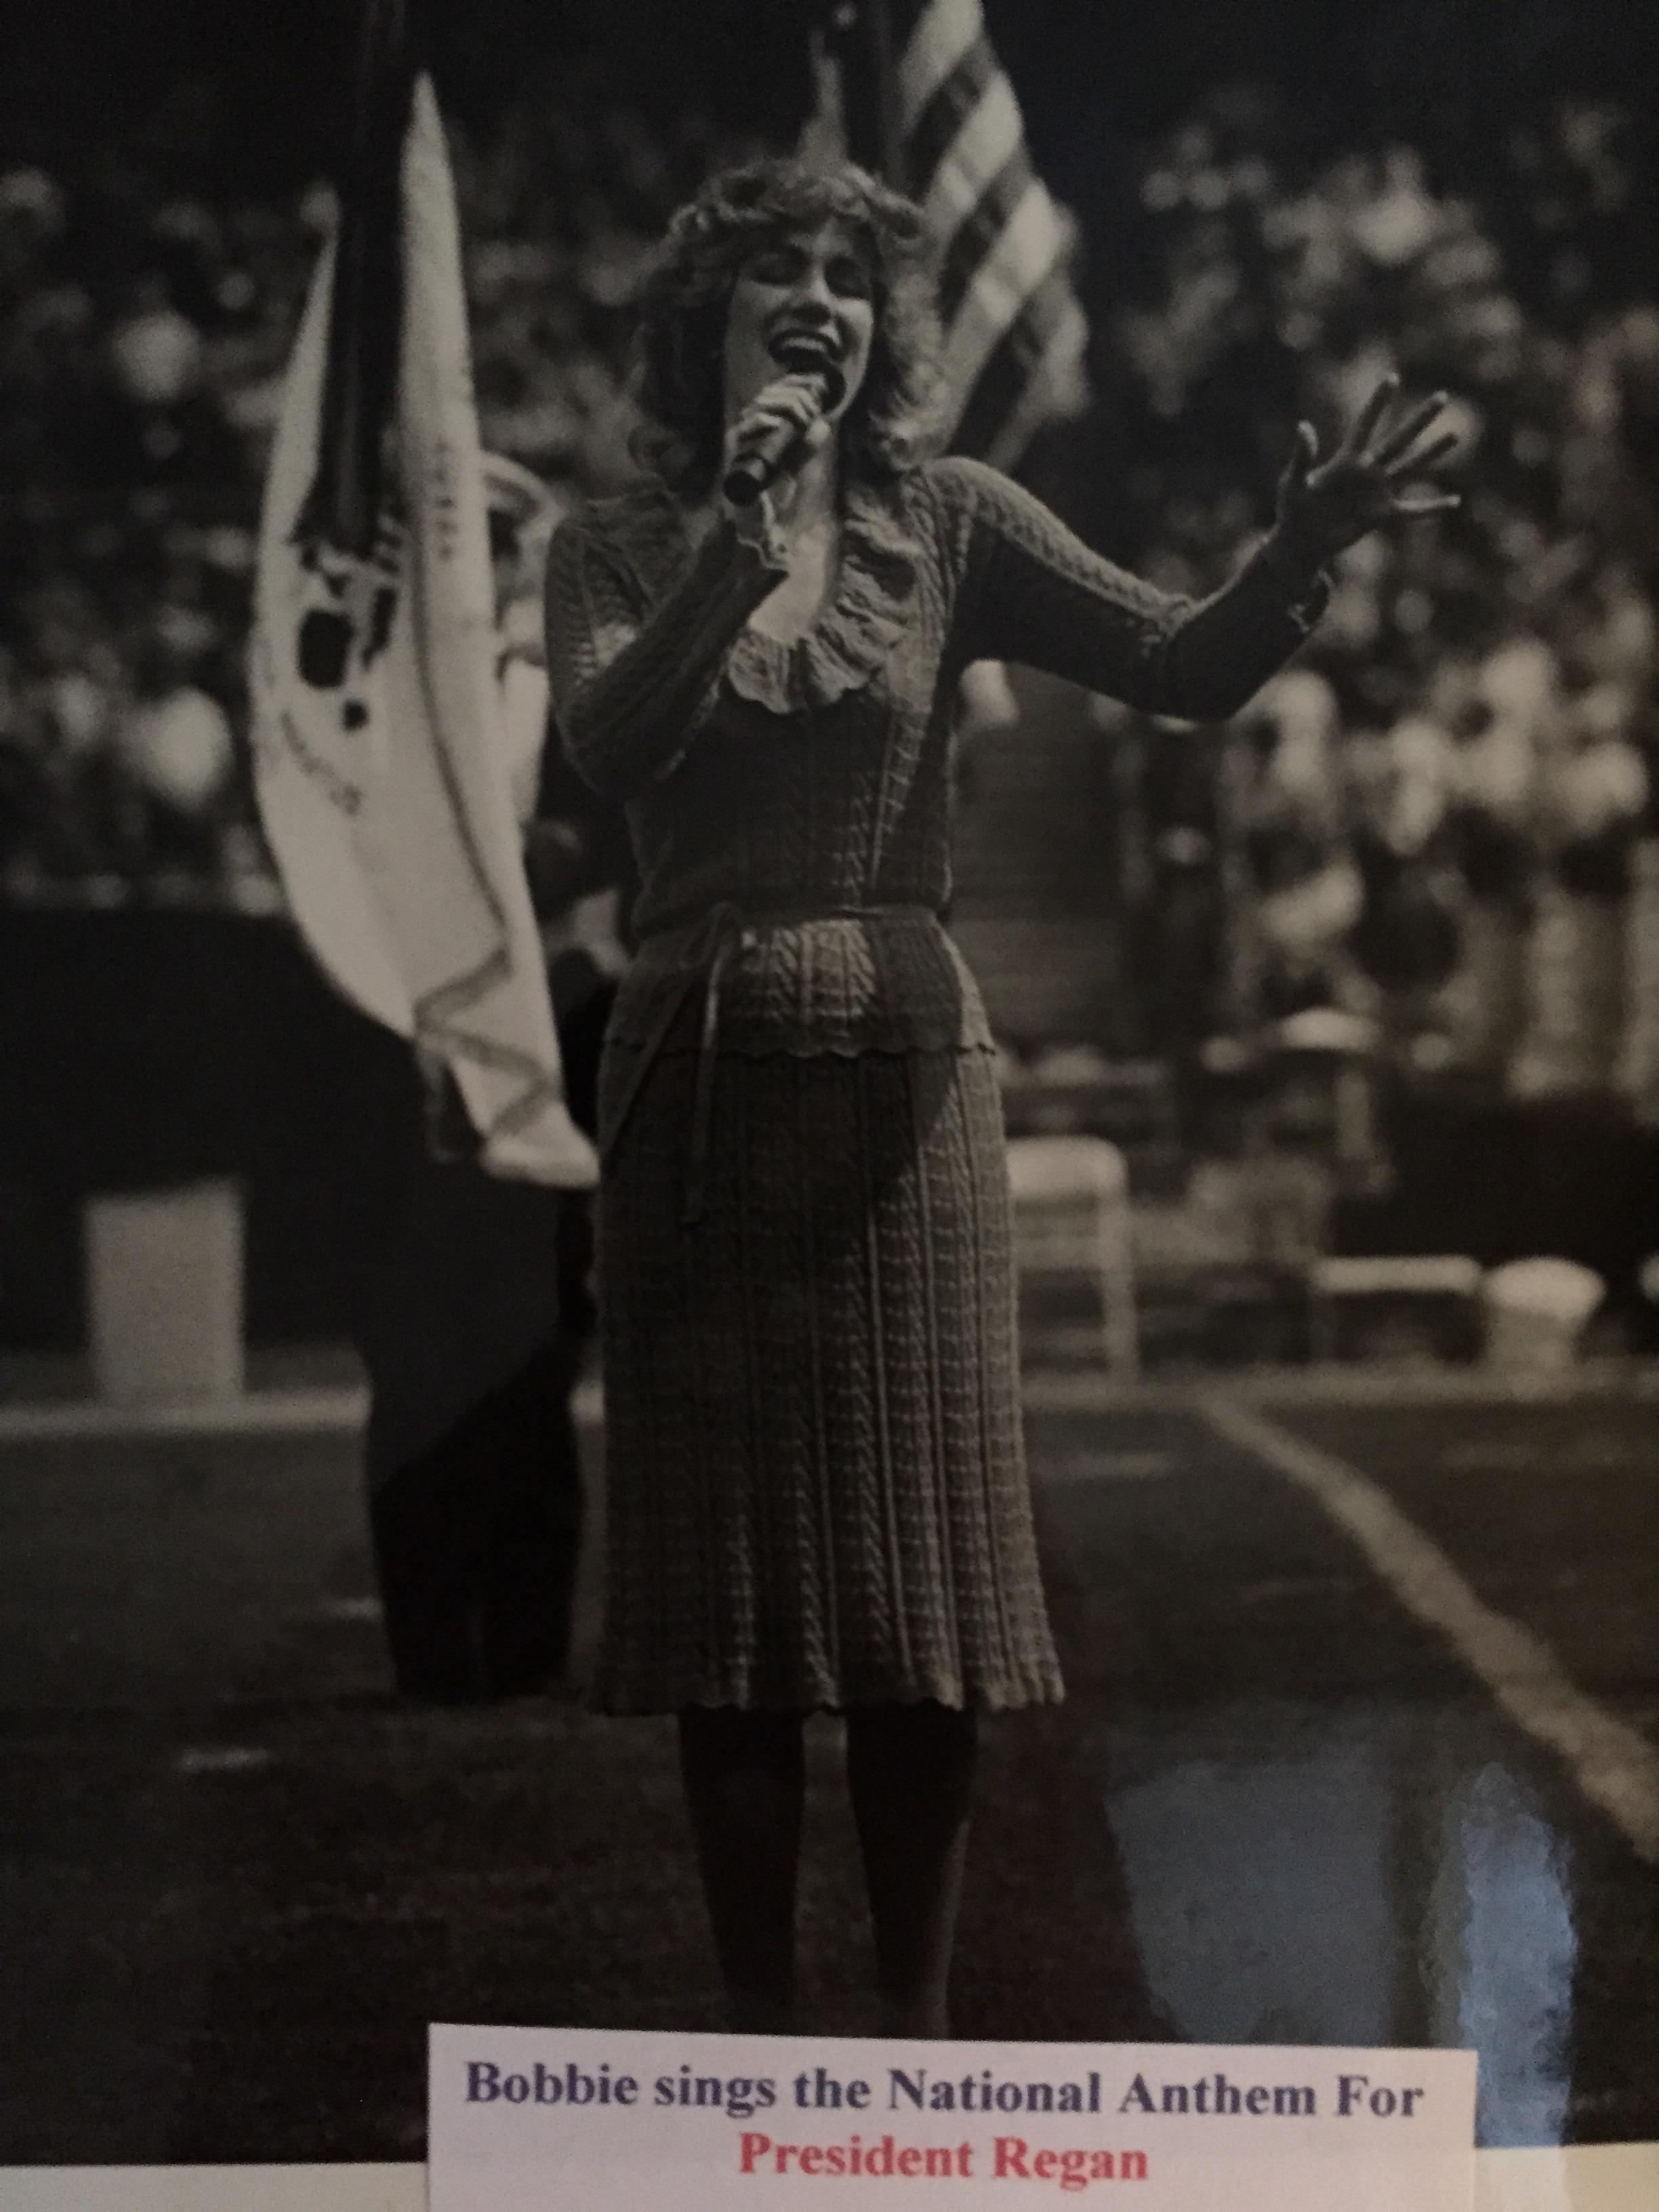 Singing for President Reagan